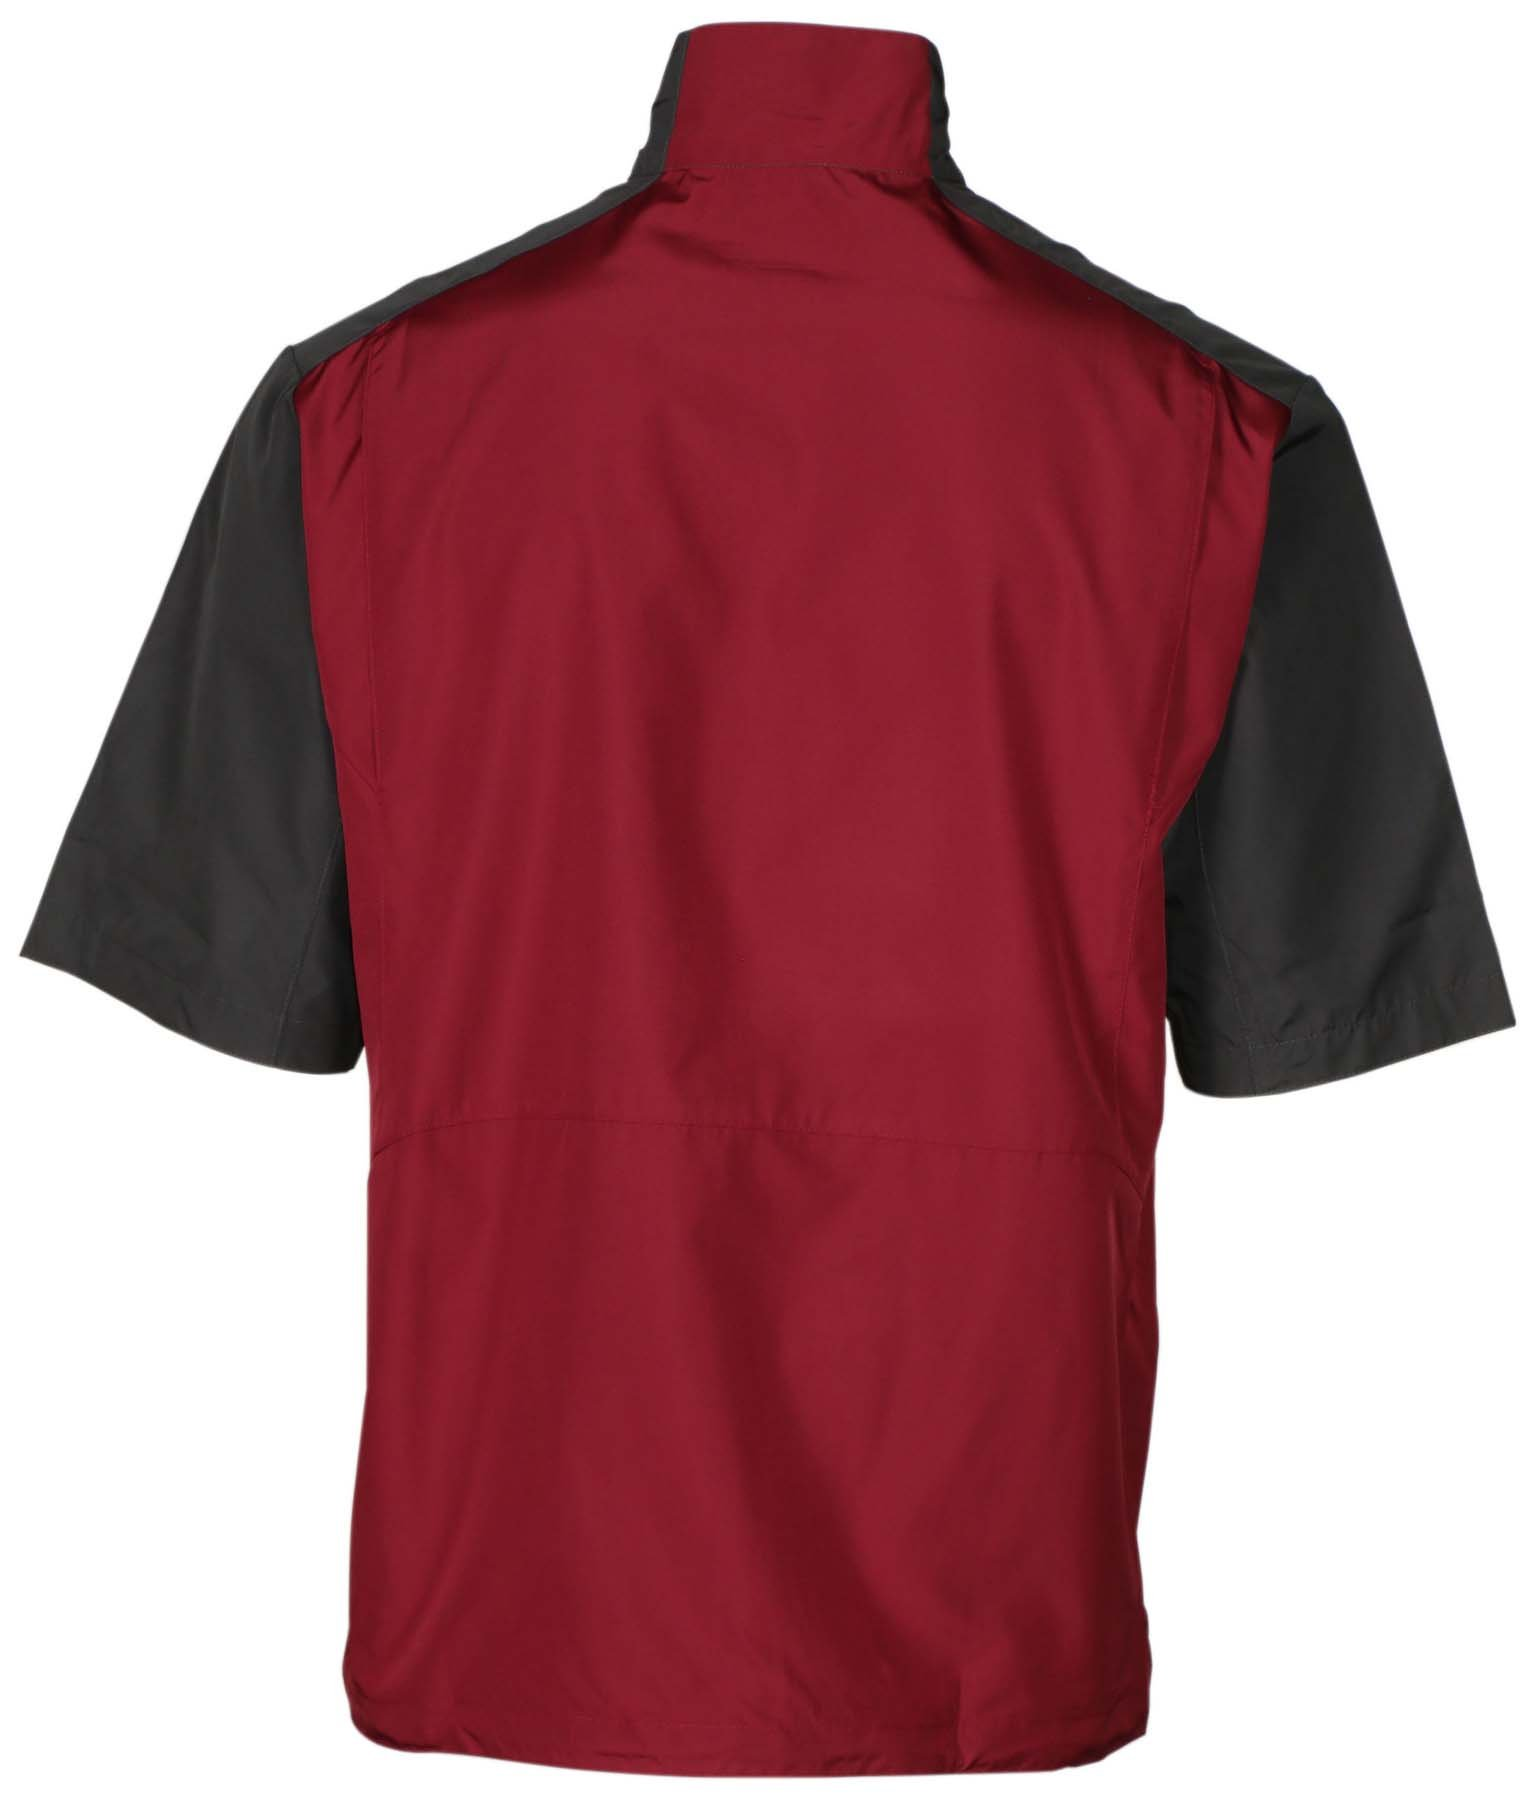 Nike Mens Storm Fit 1//2 Zip Short Sleeve Football Jacket